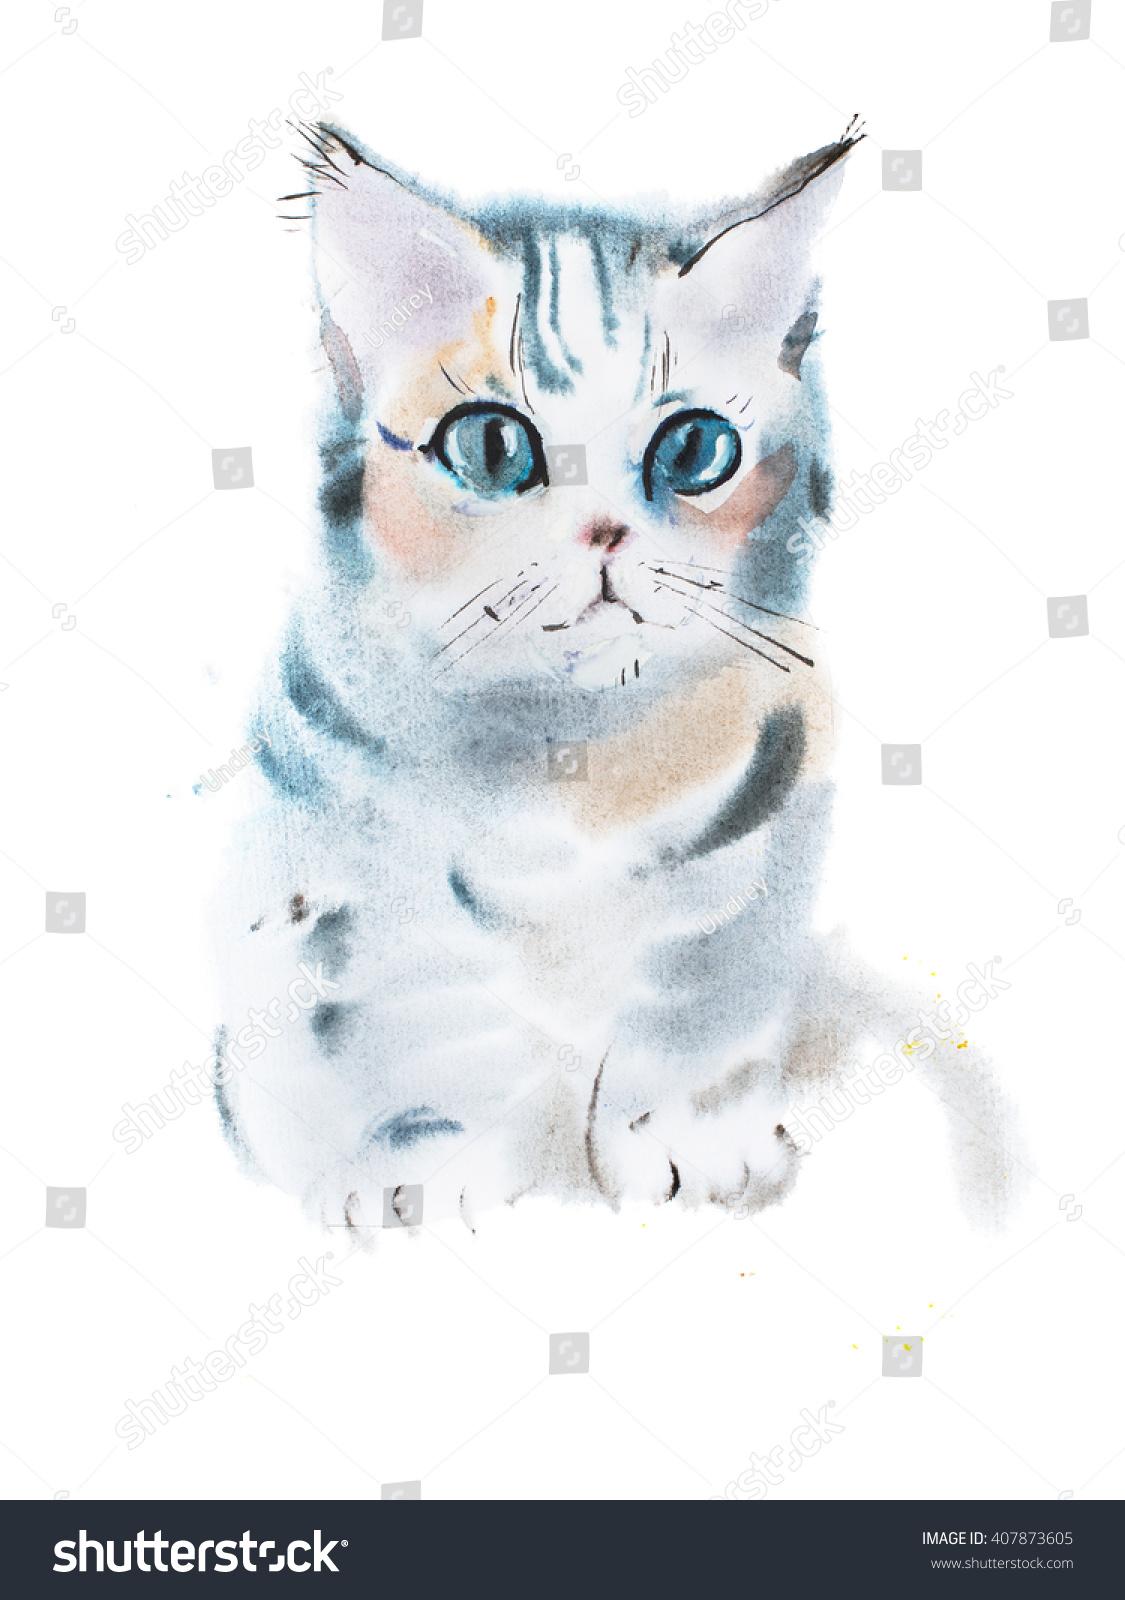 Hand drawn watercolor painting cute gray stock for Cute watercolor paintings